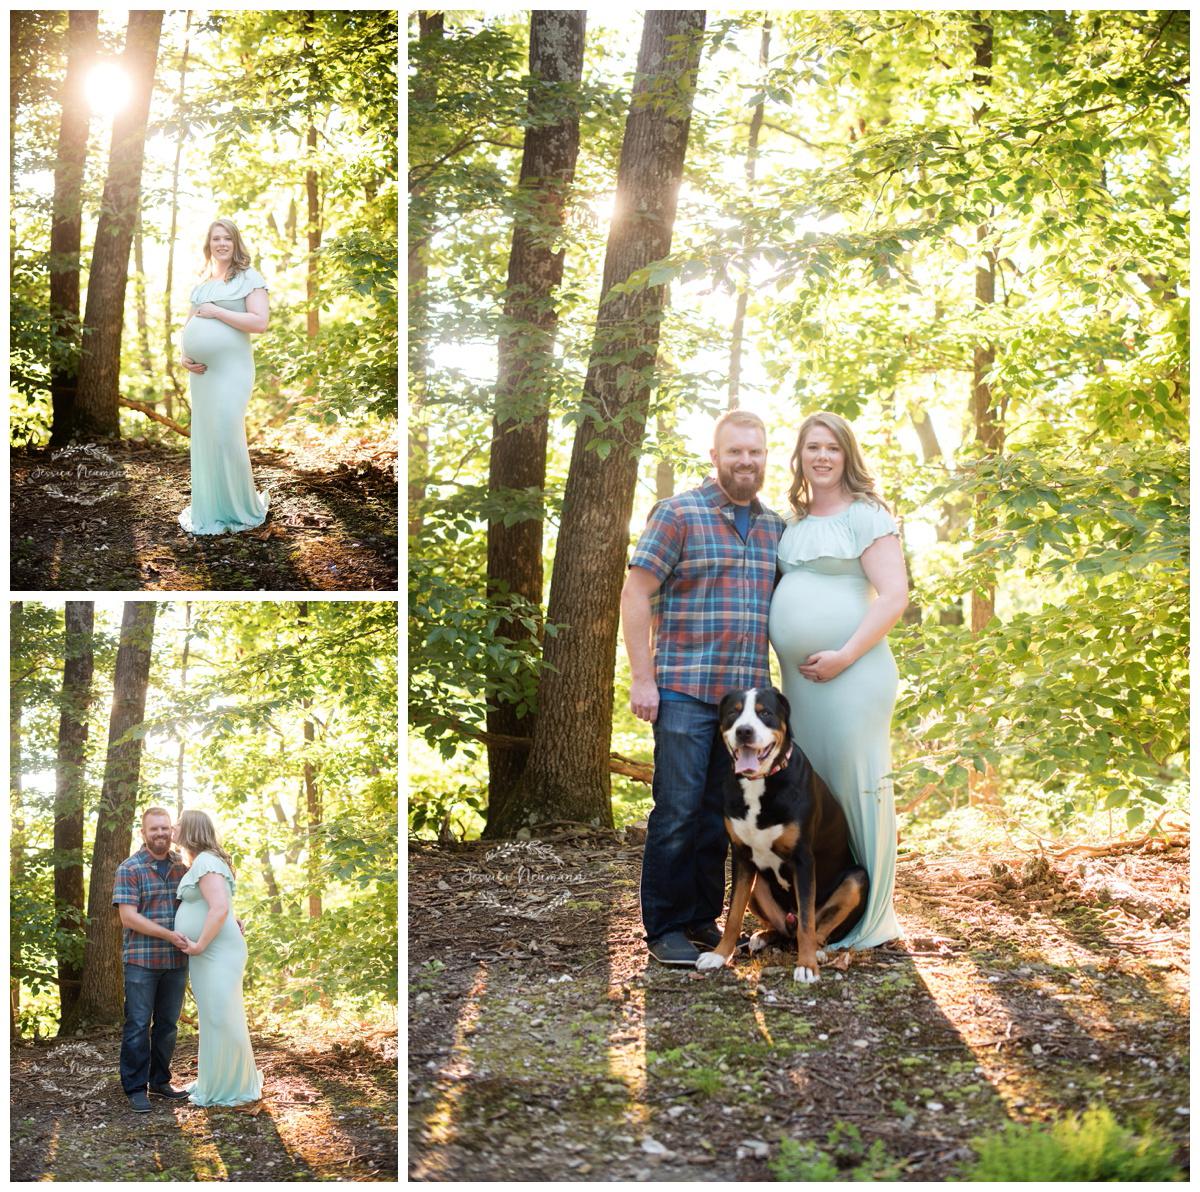 outdoor pregnancy photos with dog